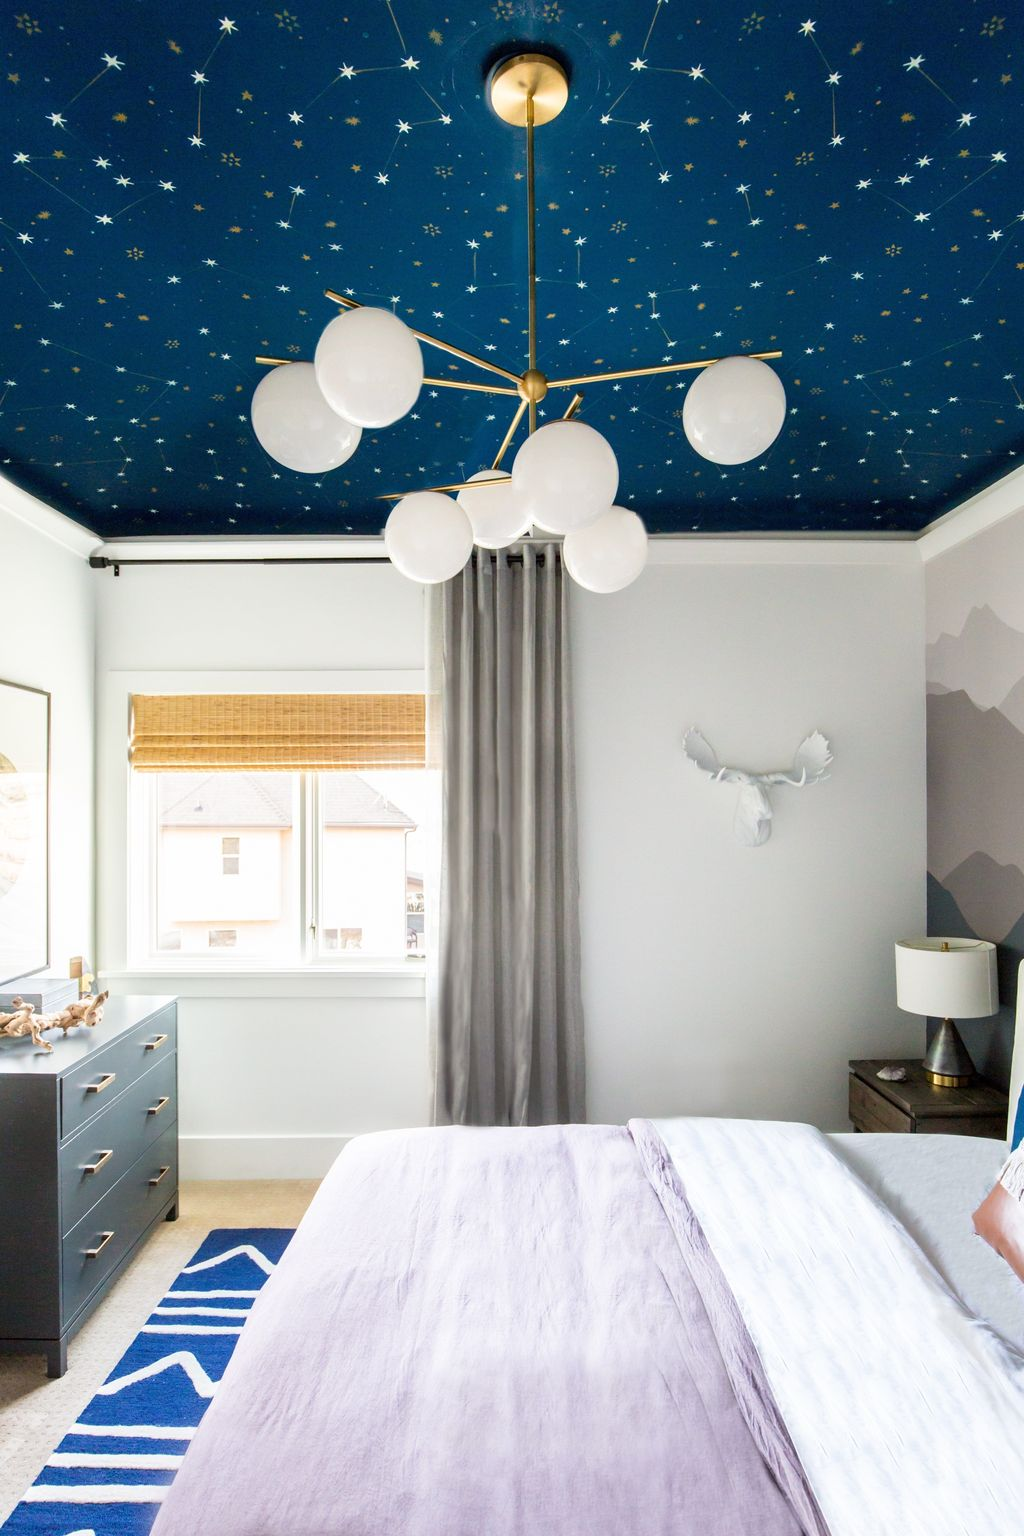 Fabulous Sky Bedroom Theme Decoration Ideas 21